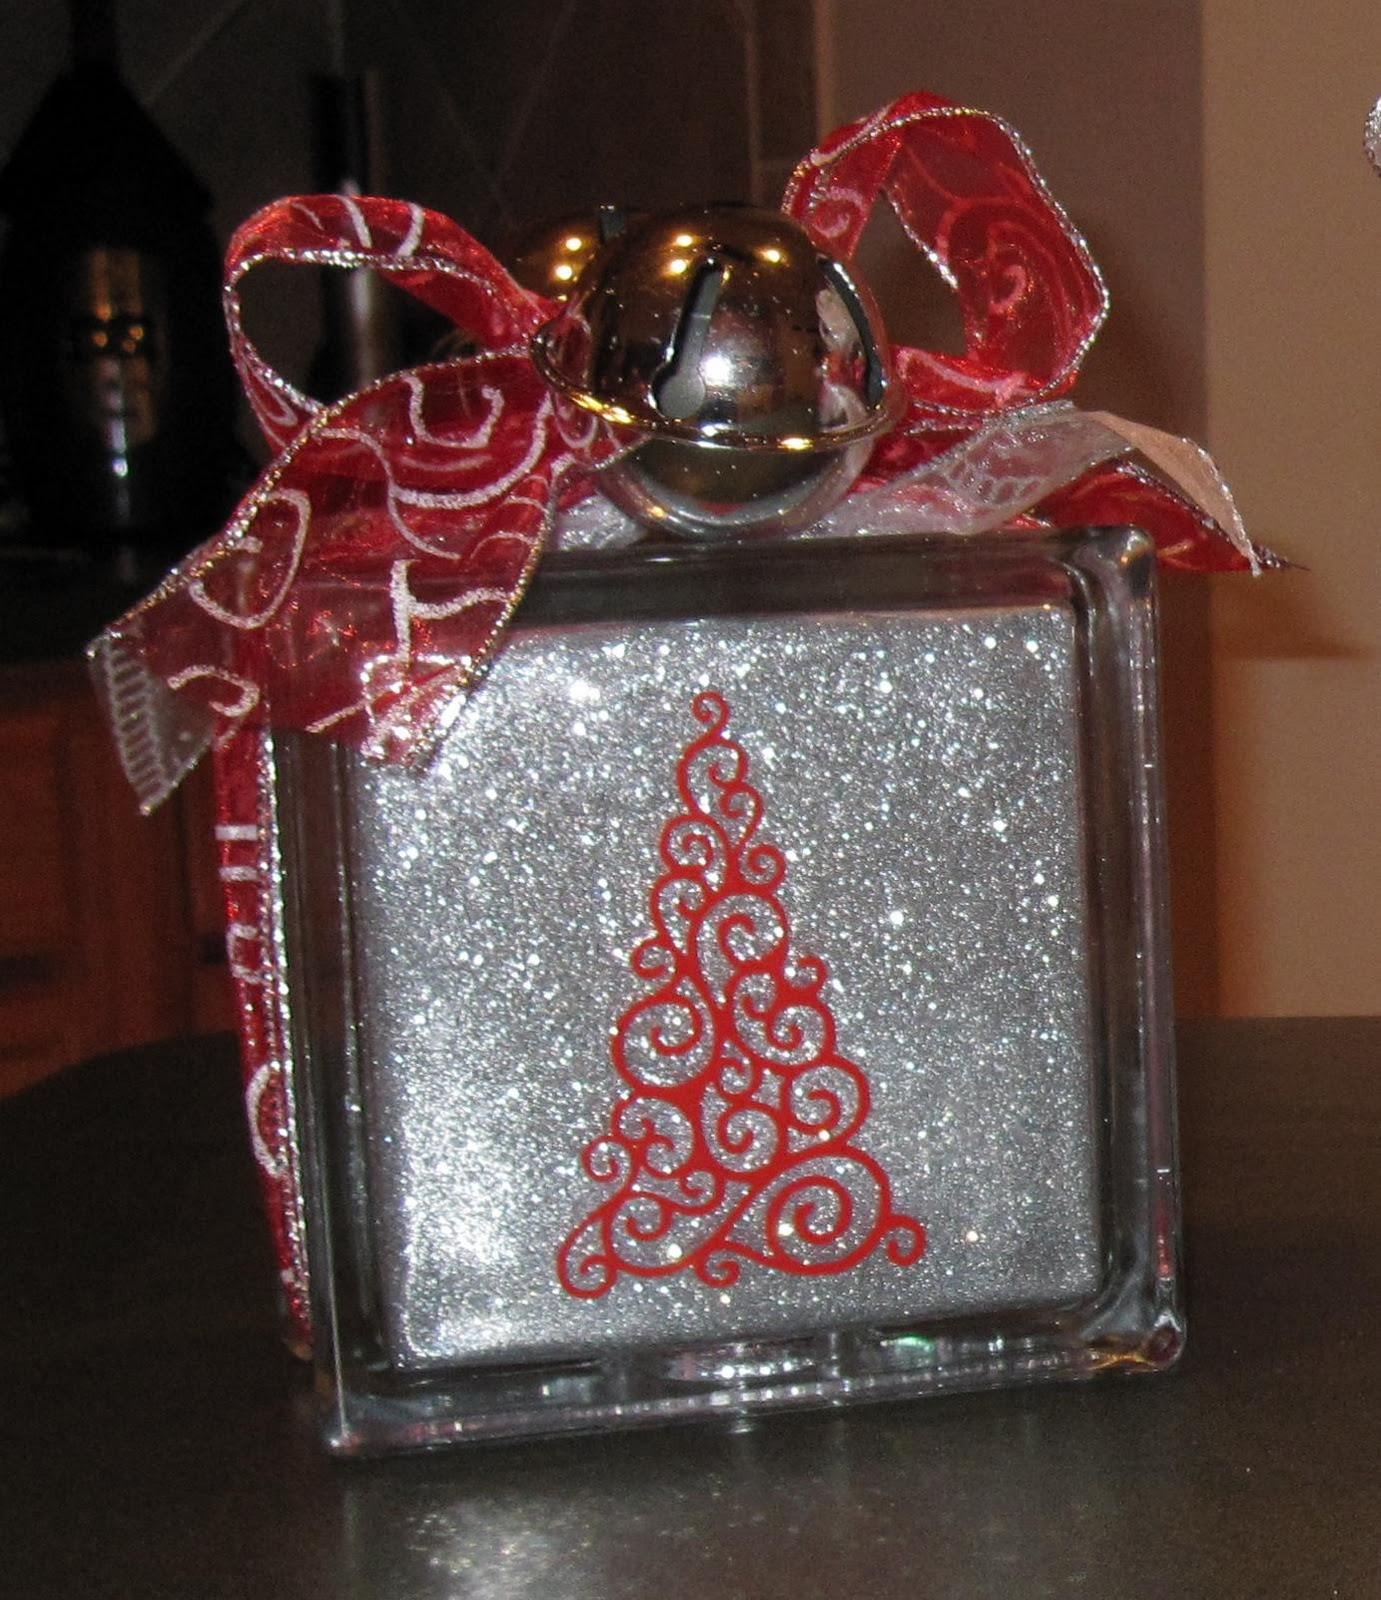 Glass block crafts projects - Glass Blocks Glitter The Final Project